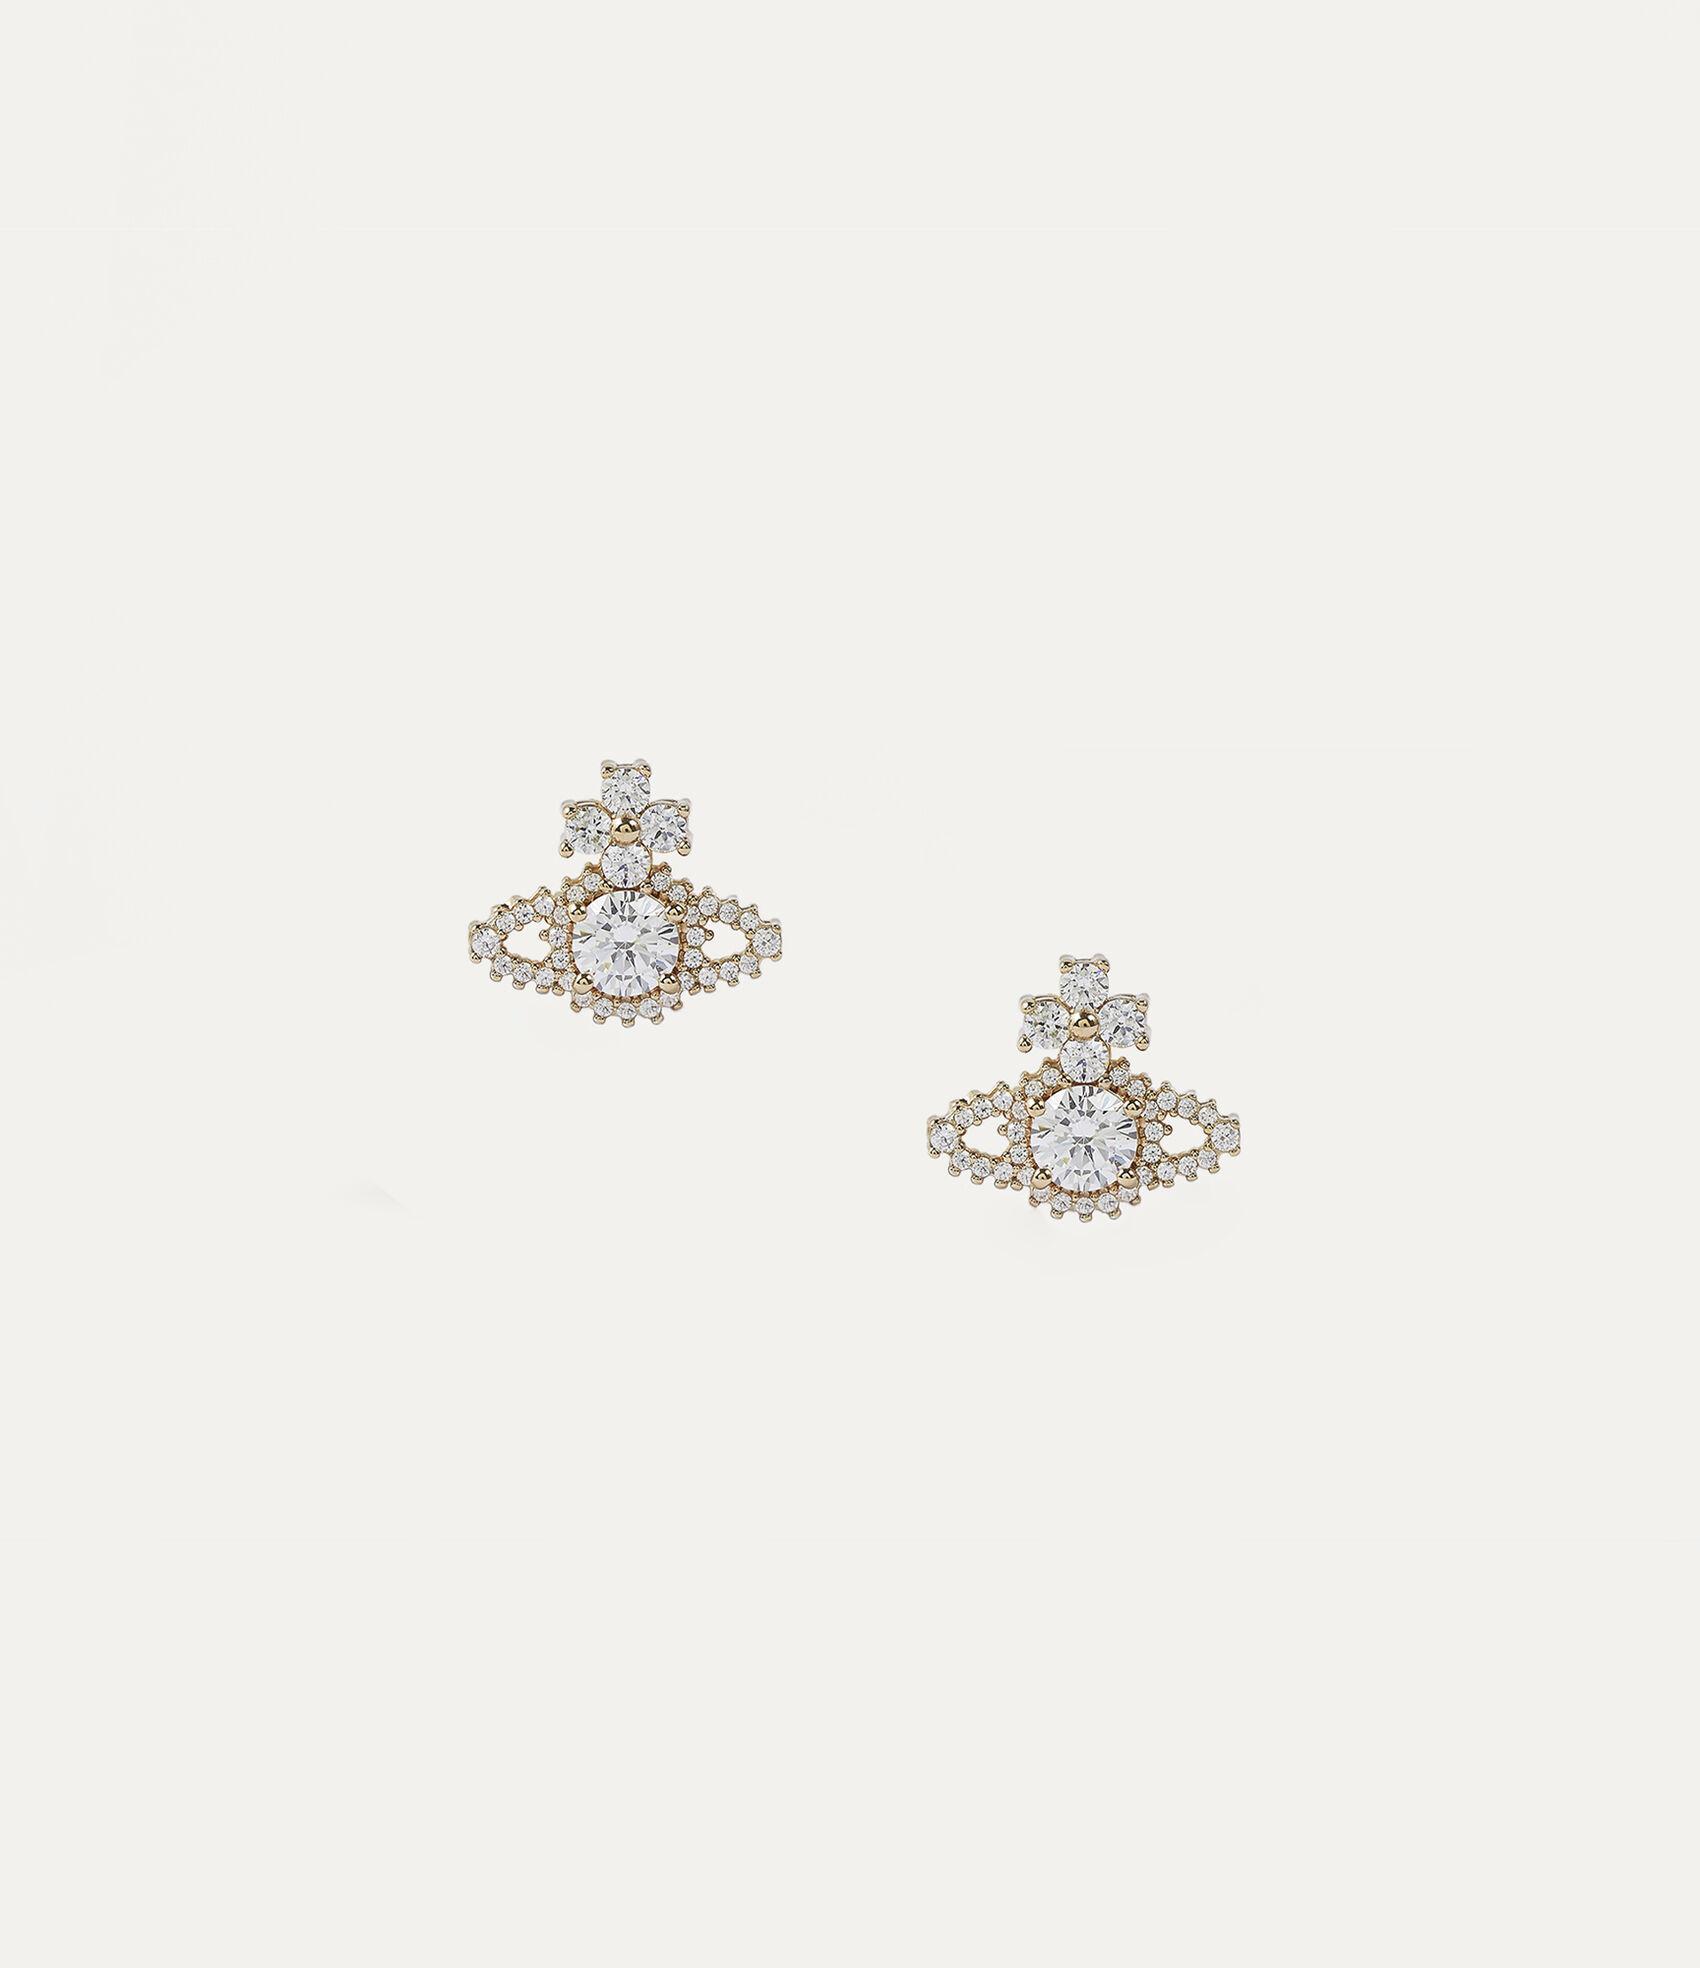 42903b2e9 Valentina Stud Earrings Golden Tone | Women's Earrings | Vivienne ...